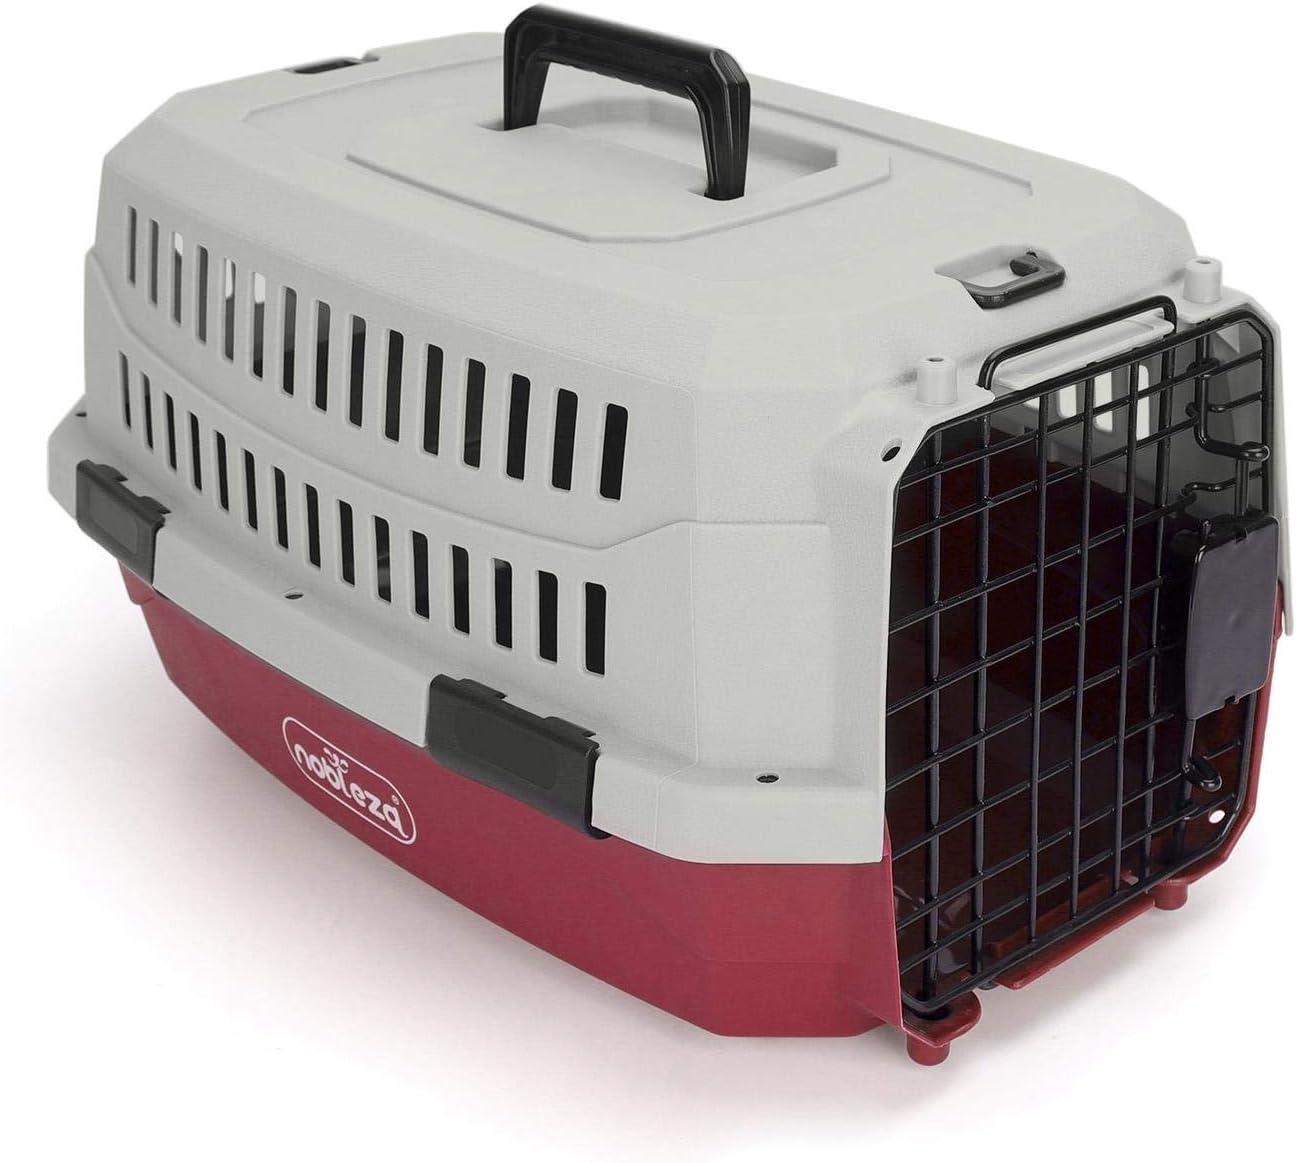 Nobleza - Transportin Gato Perro Grande, Transportin para Gatos Perro Portátil y Transpirable, Mascotas Perros Gatos Accesorios, Transportín de Plástico, 68x48x42 CM, Rojo & Gris